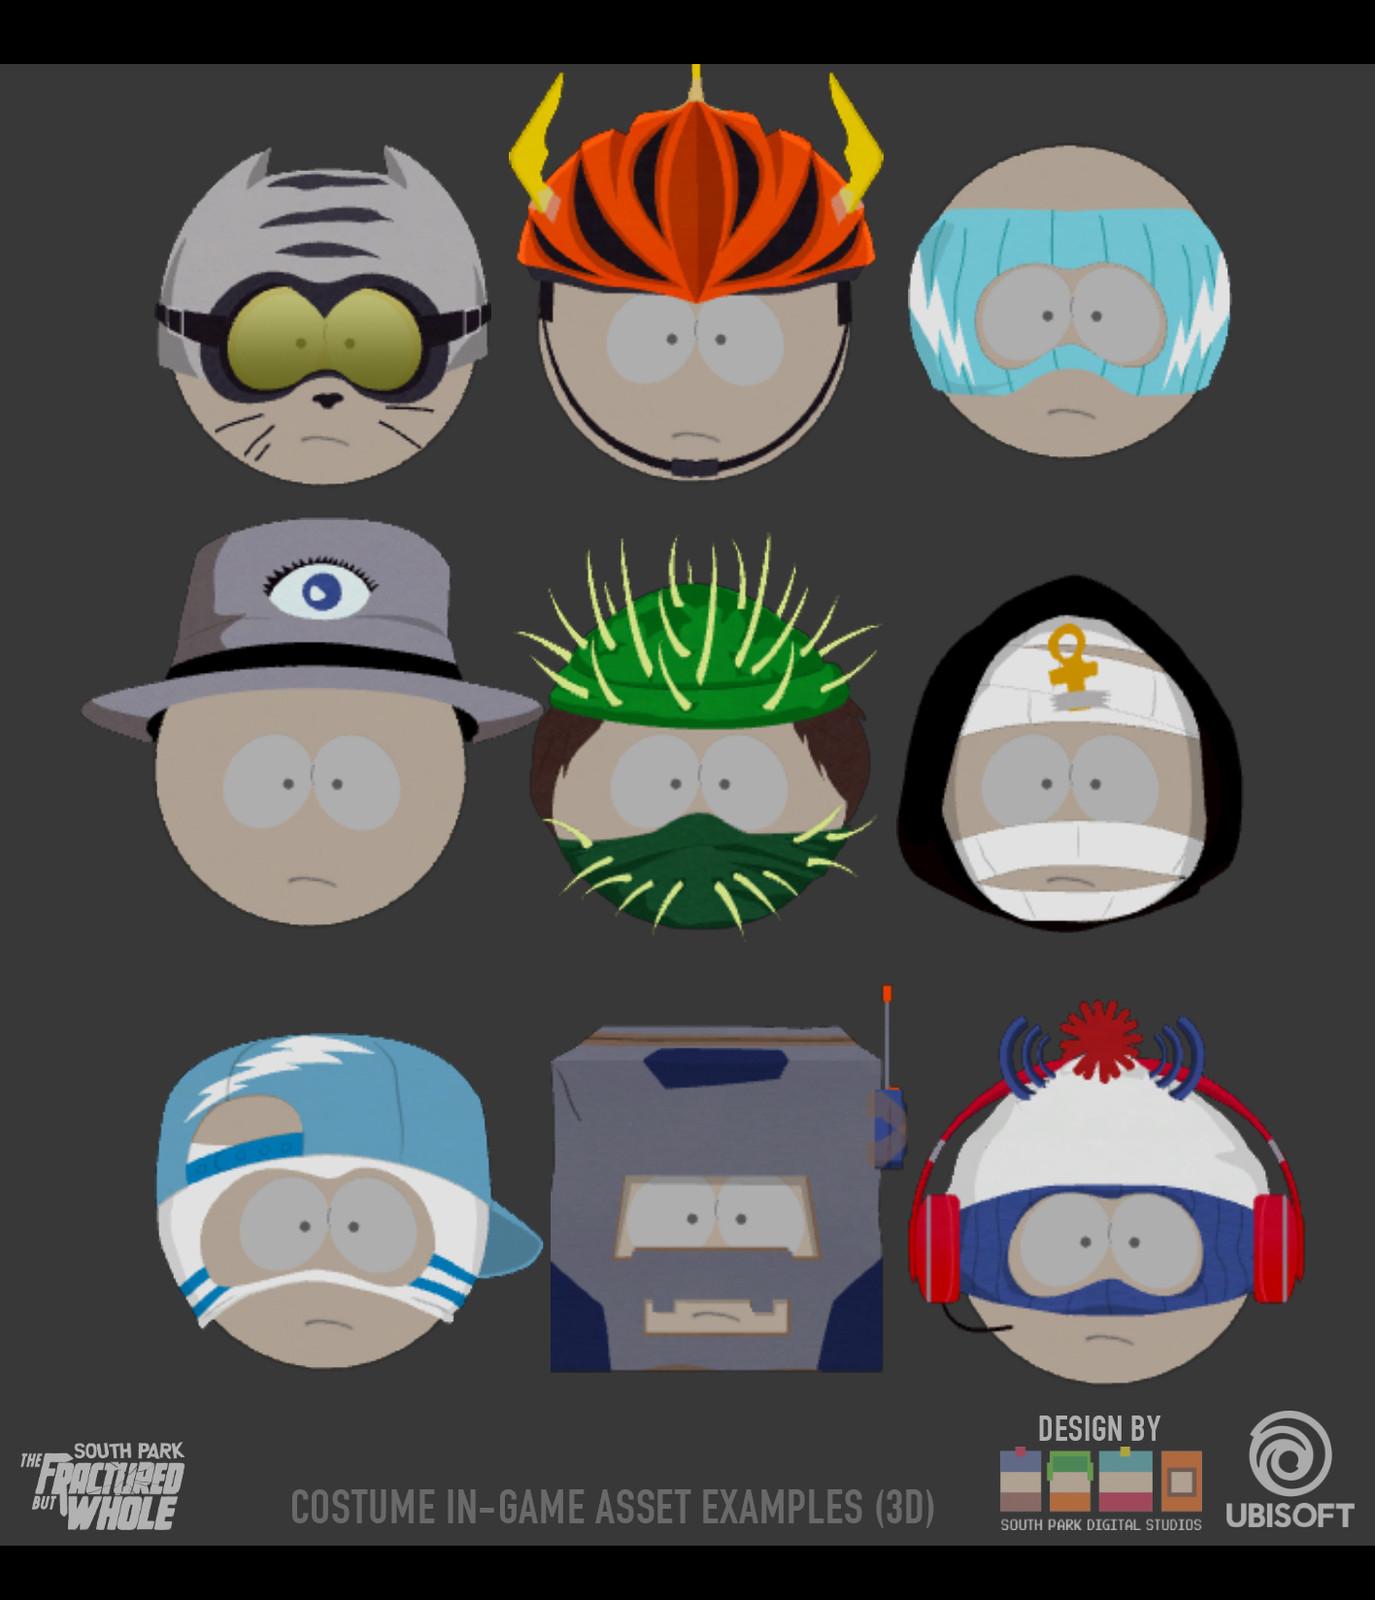 Selection of Head Gear made in Maya - Original Designs by South Park Digital Studios